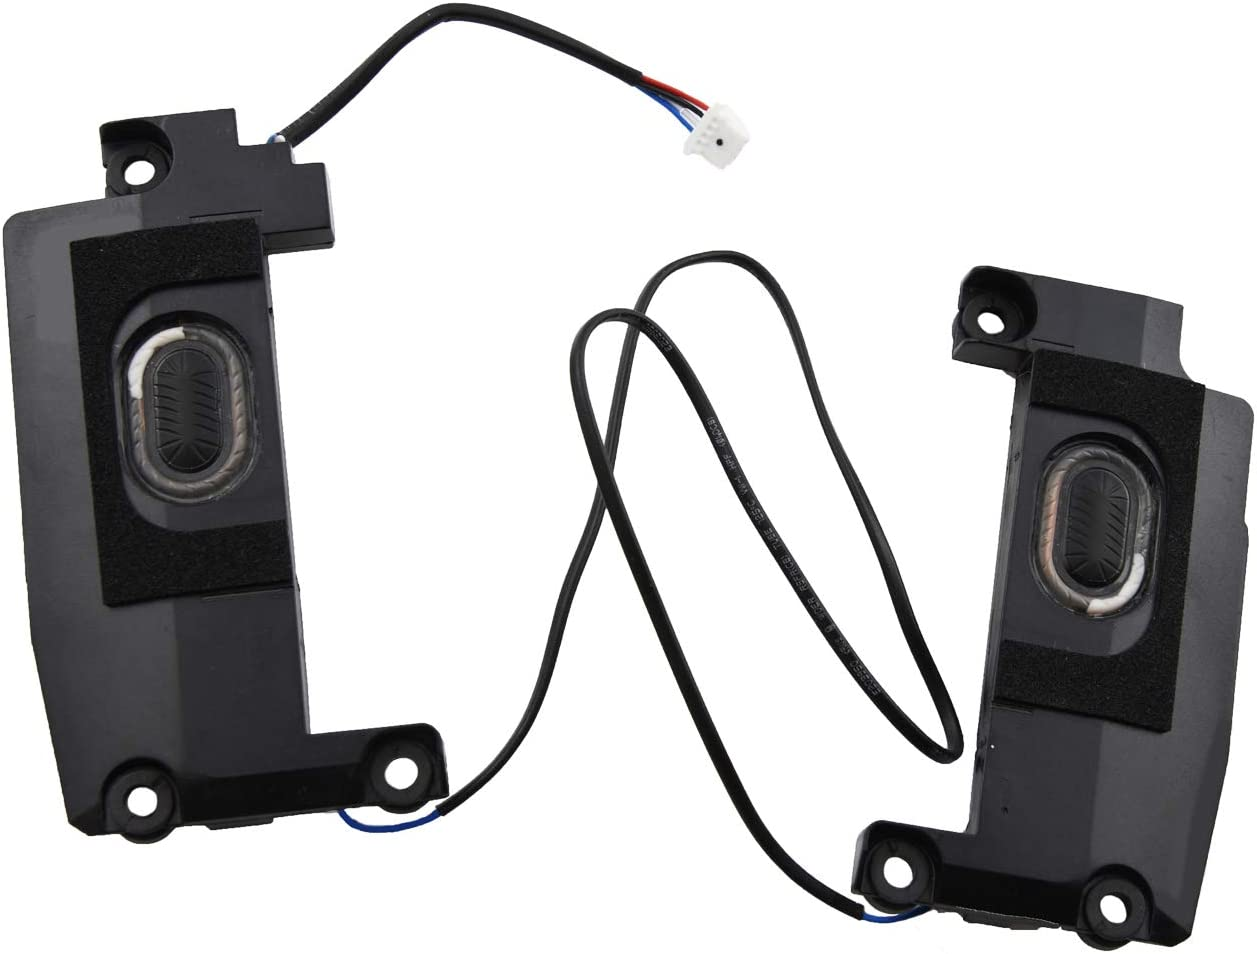 WirelessFinest Internal Speakers Left + Right Replacement for Lenovo Thinkpad T460 T460S T470S PK23000N2Y0 00JT988 Repair Part Fix Sound Muffled Distort Buzz Broken Speaker